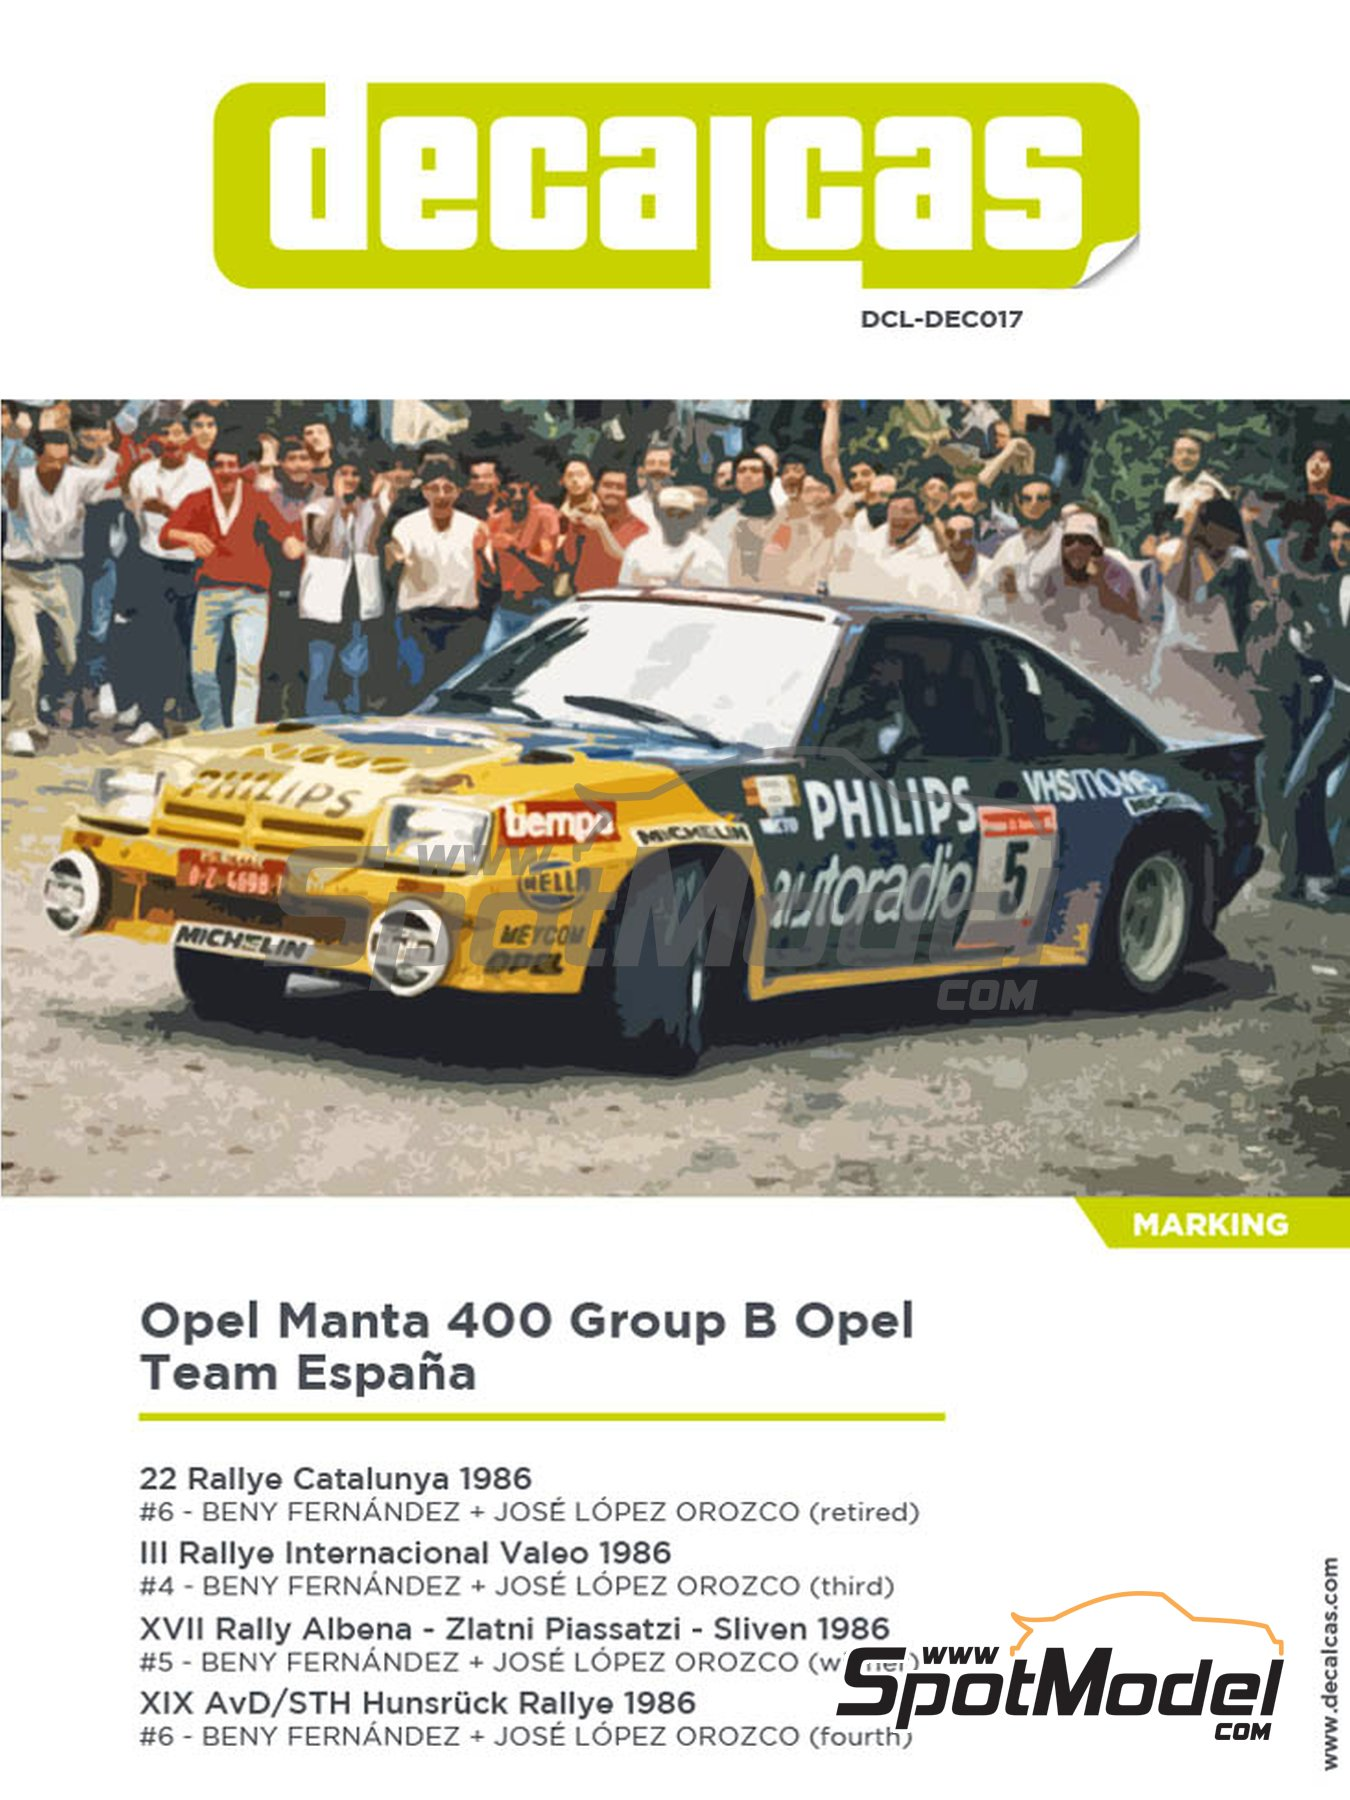 Opel Manta 400 Group B Opel Team España - AvD/STH Hunsrück Rallye, Valeo Rally, Rallye Catalunya, Rally Albena - Zlatni Piassatzi - Sliven 1986 | Marking / livery in 1/24 scale manufactured by Decalcas (ref.DCL-DEC017) image